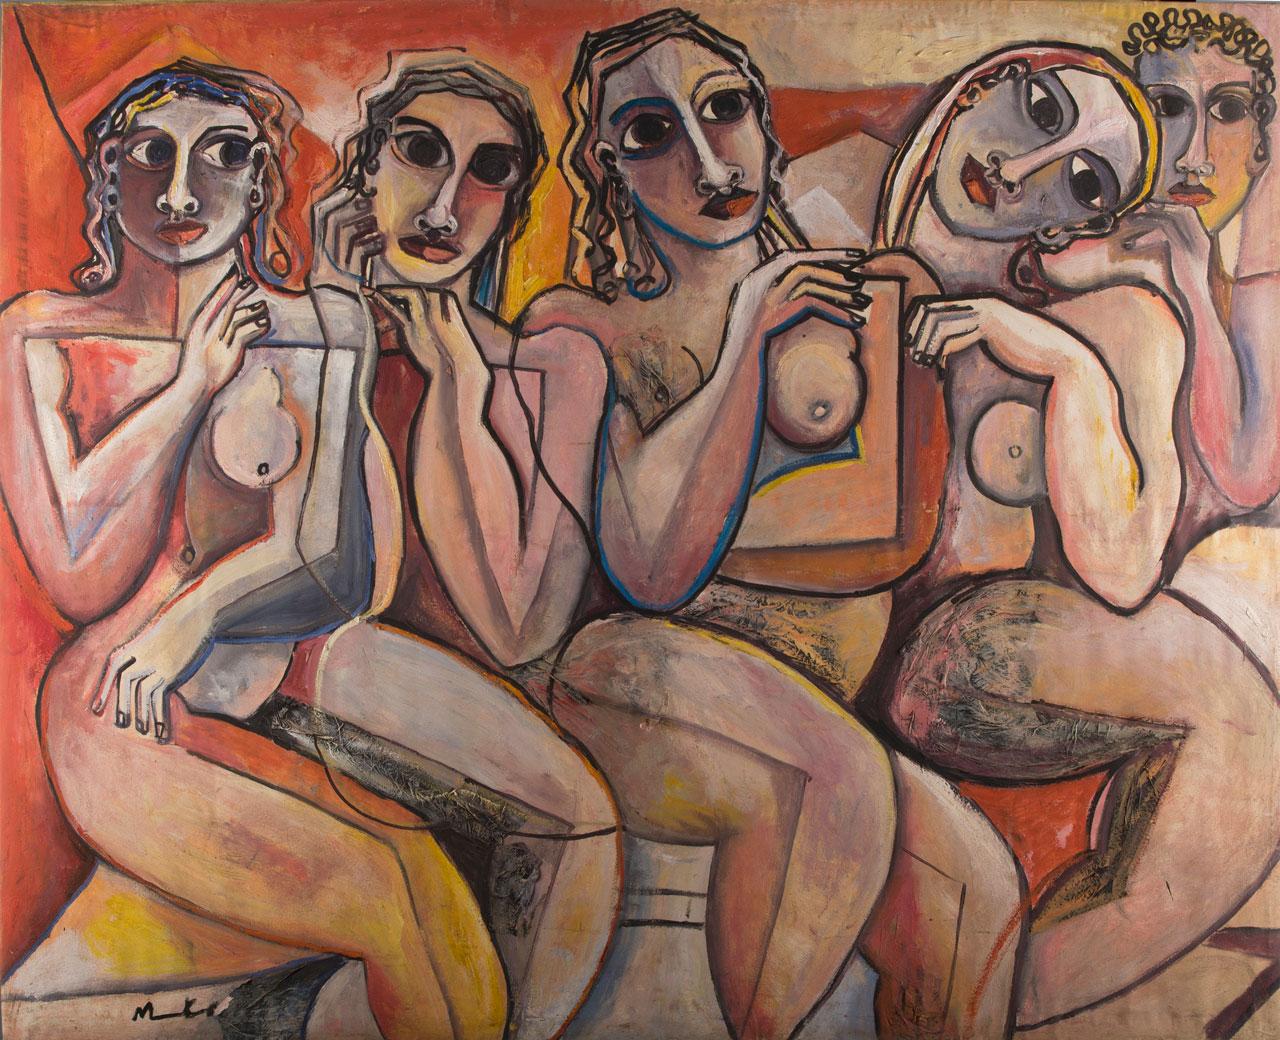 Geoffrey Mukasa (Ugandan, 1954-2009), Nudes , 2006, oil on canvas and barkcloth,120cm x 150cm